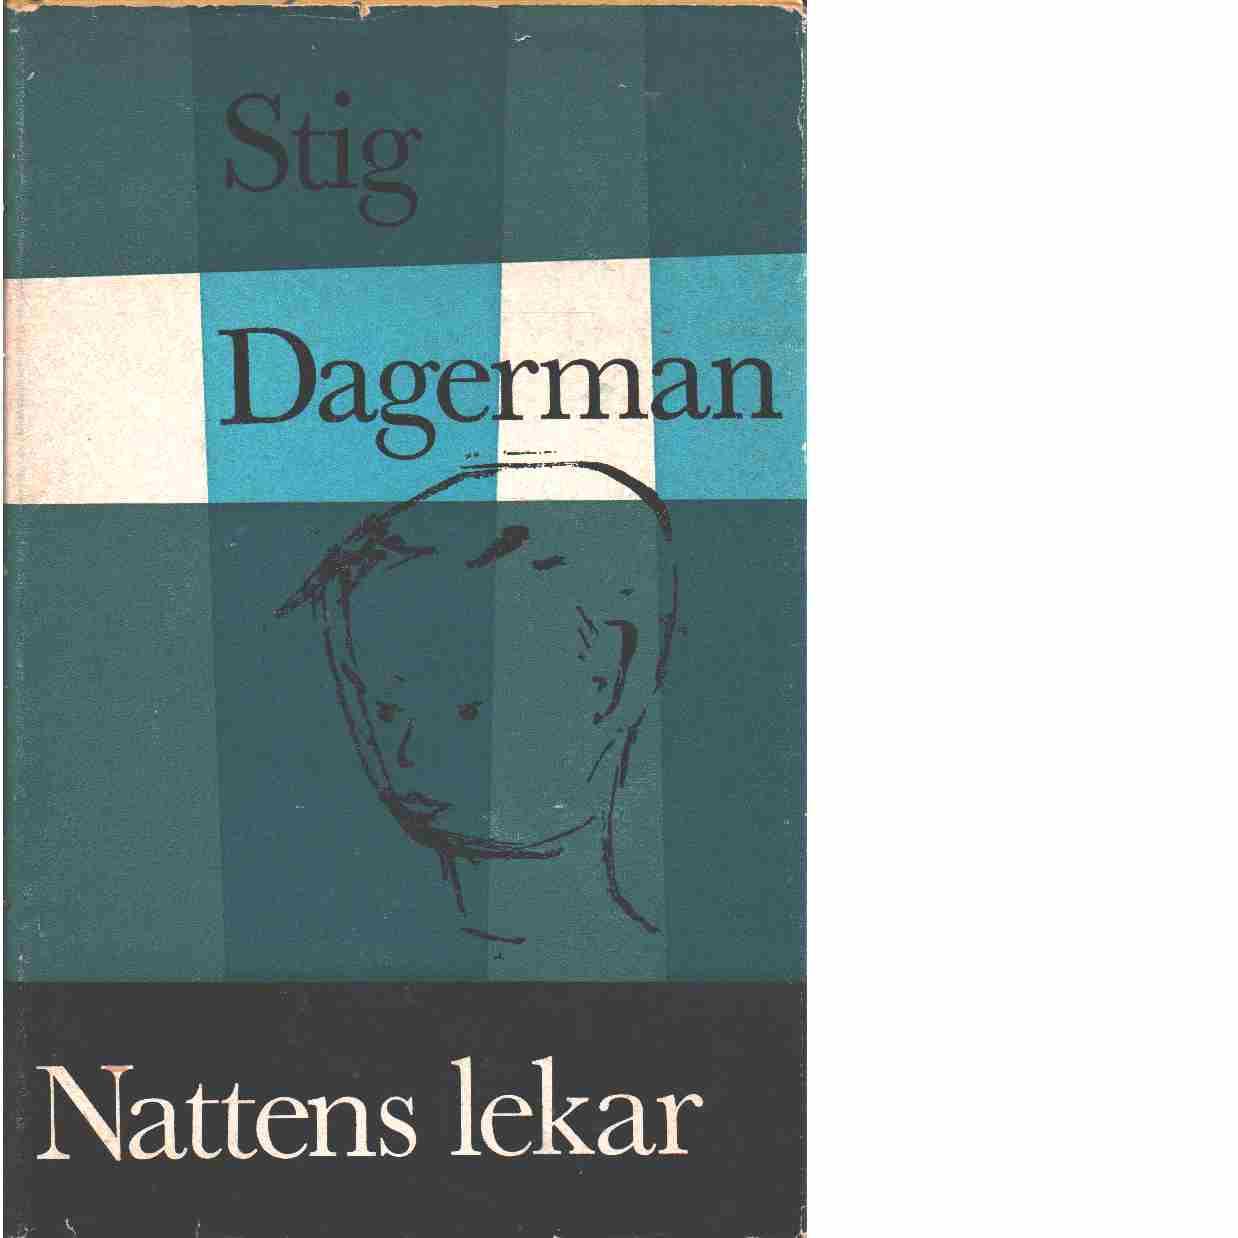 Nattens lekar - Dagerman, Stig